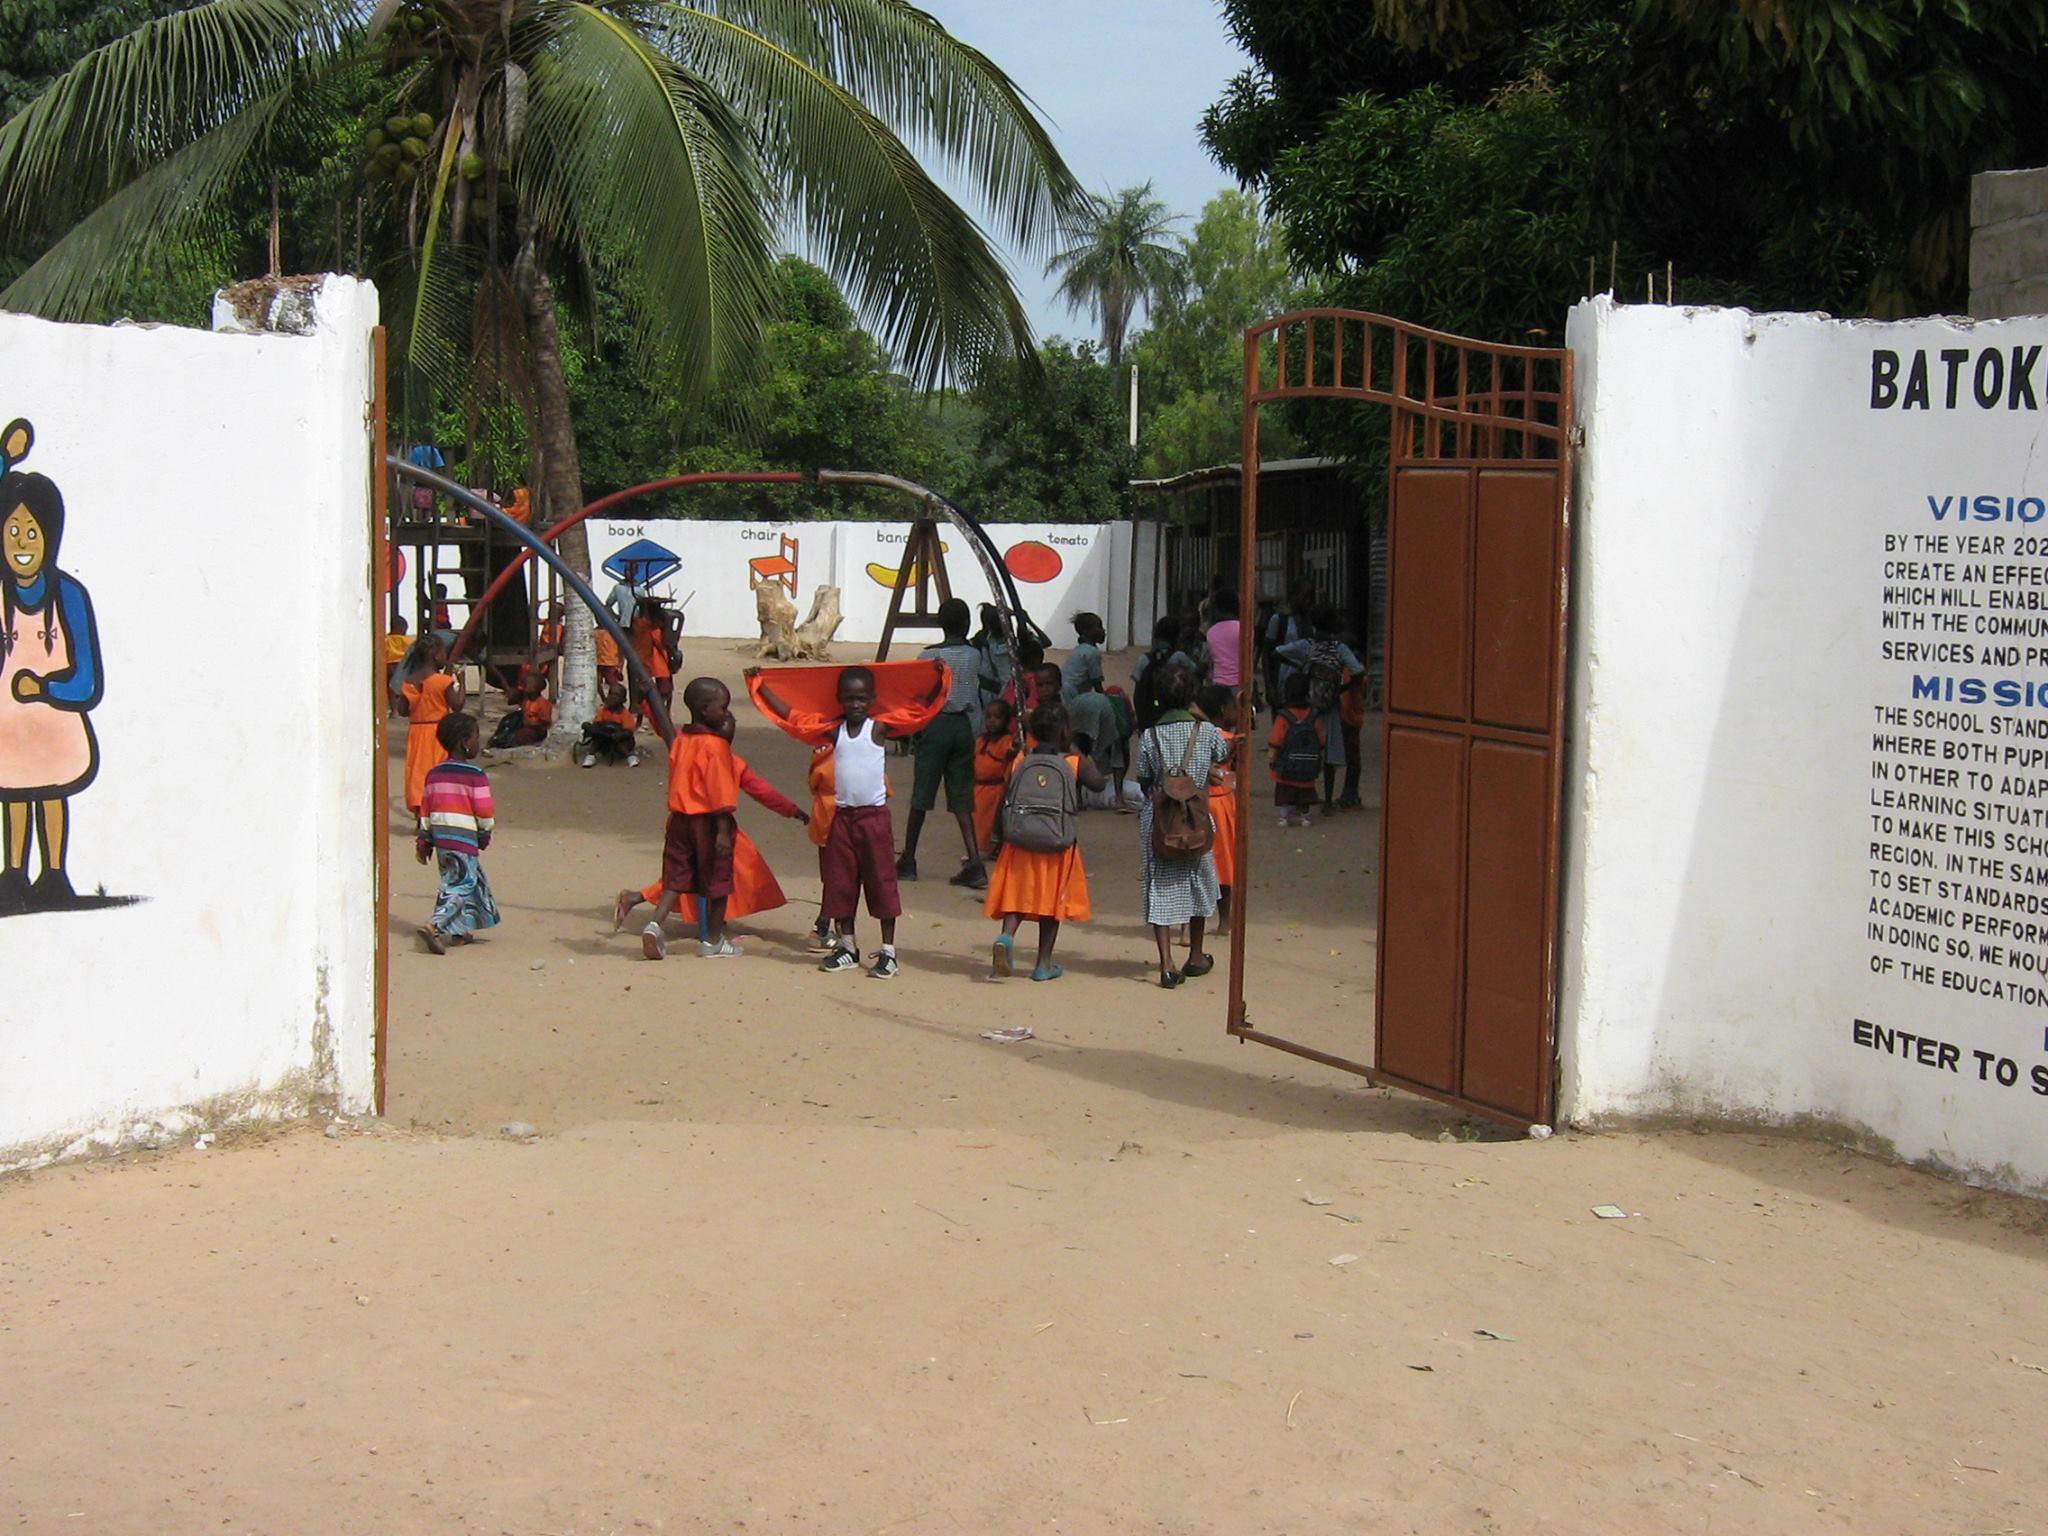 Batokunku Nursery and Primary School